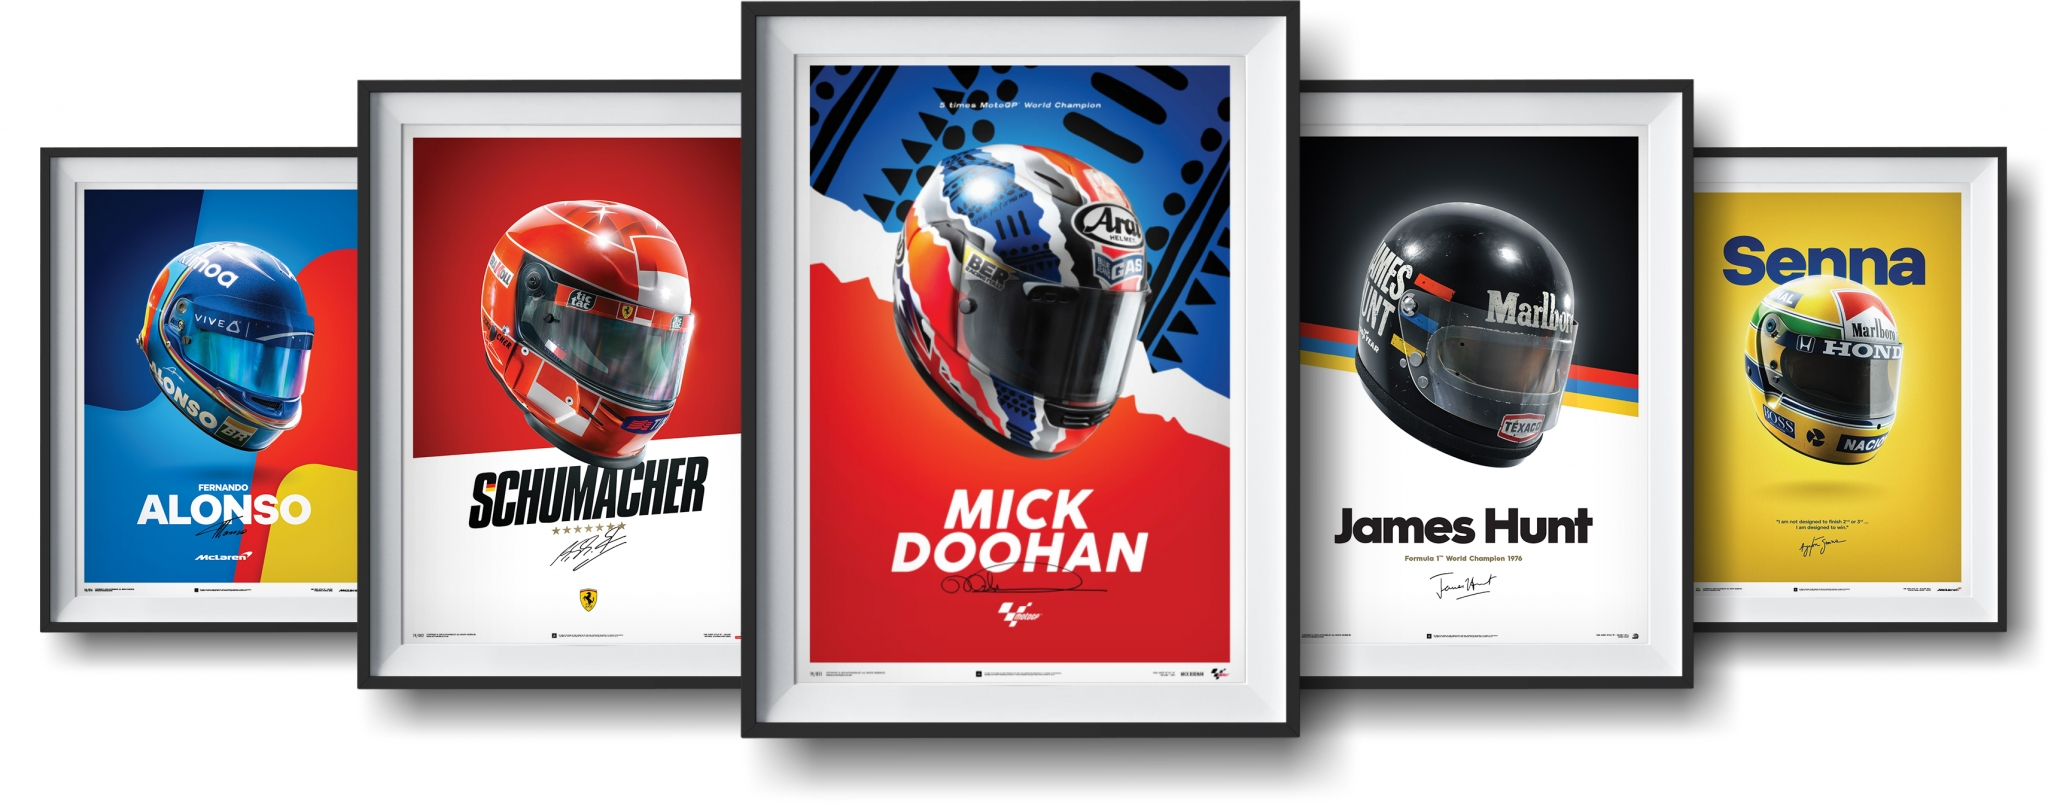 Automobilist Helmet Collection